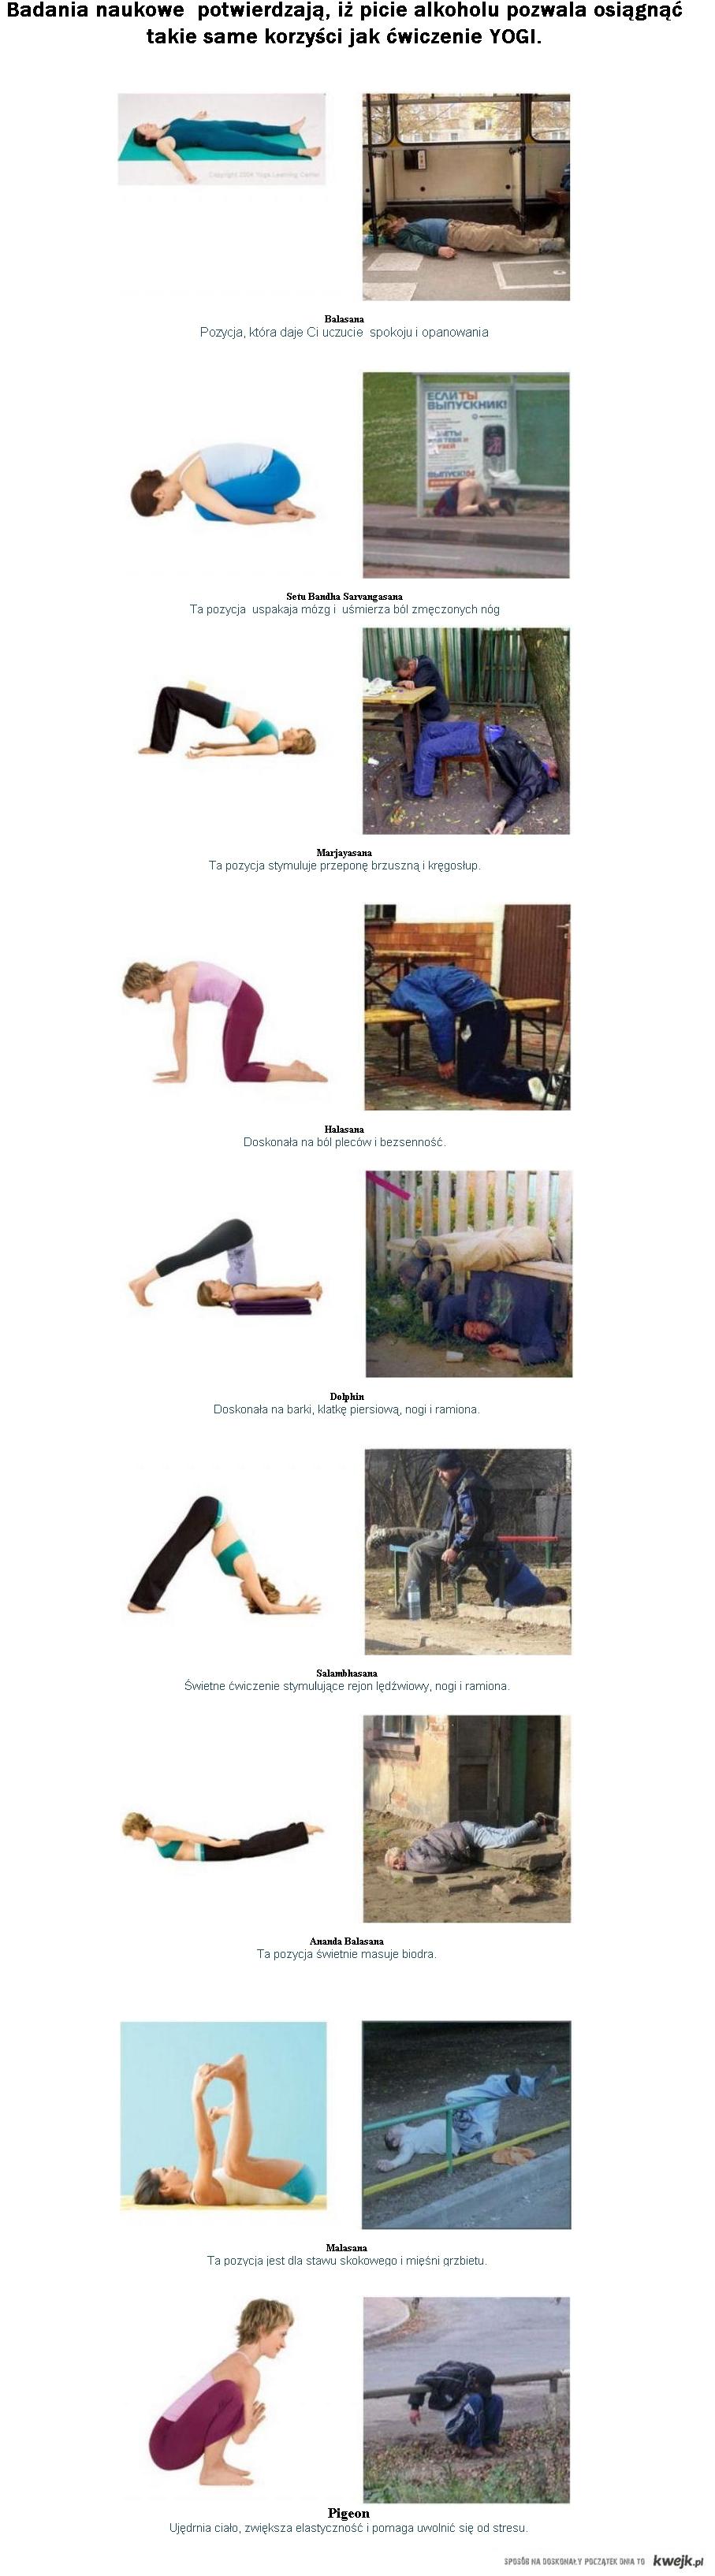 alko vs yoga